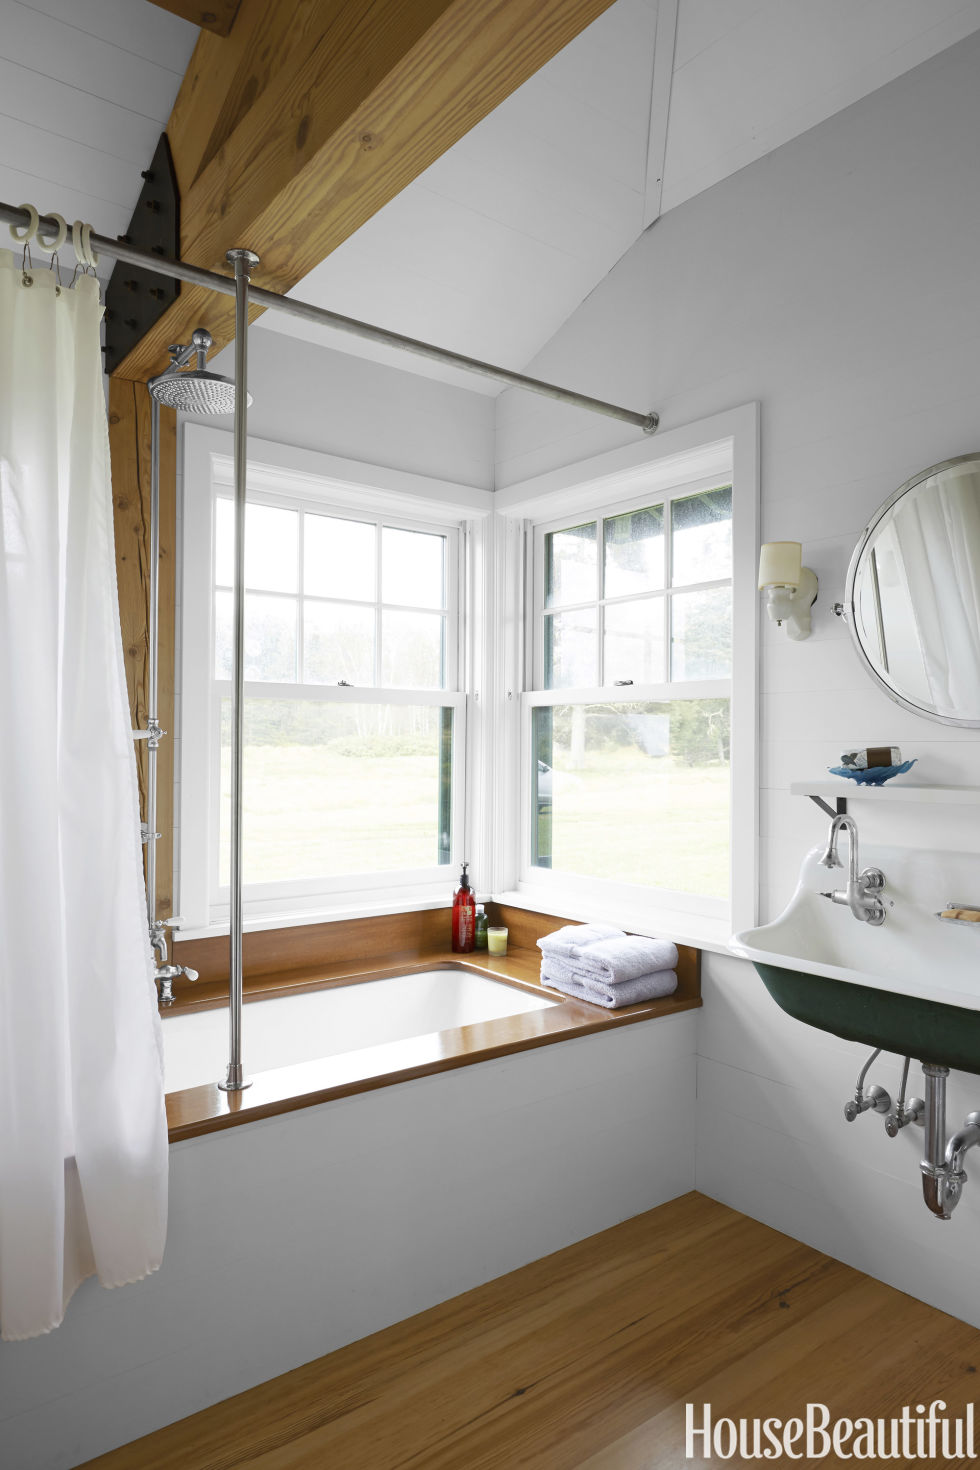 135+ Best Bathroom Design Ideas - Decor Pictures of Stylish Modern Bathrooms